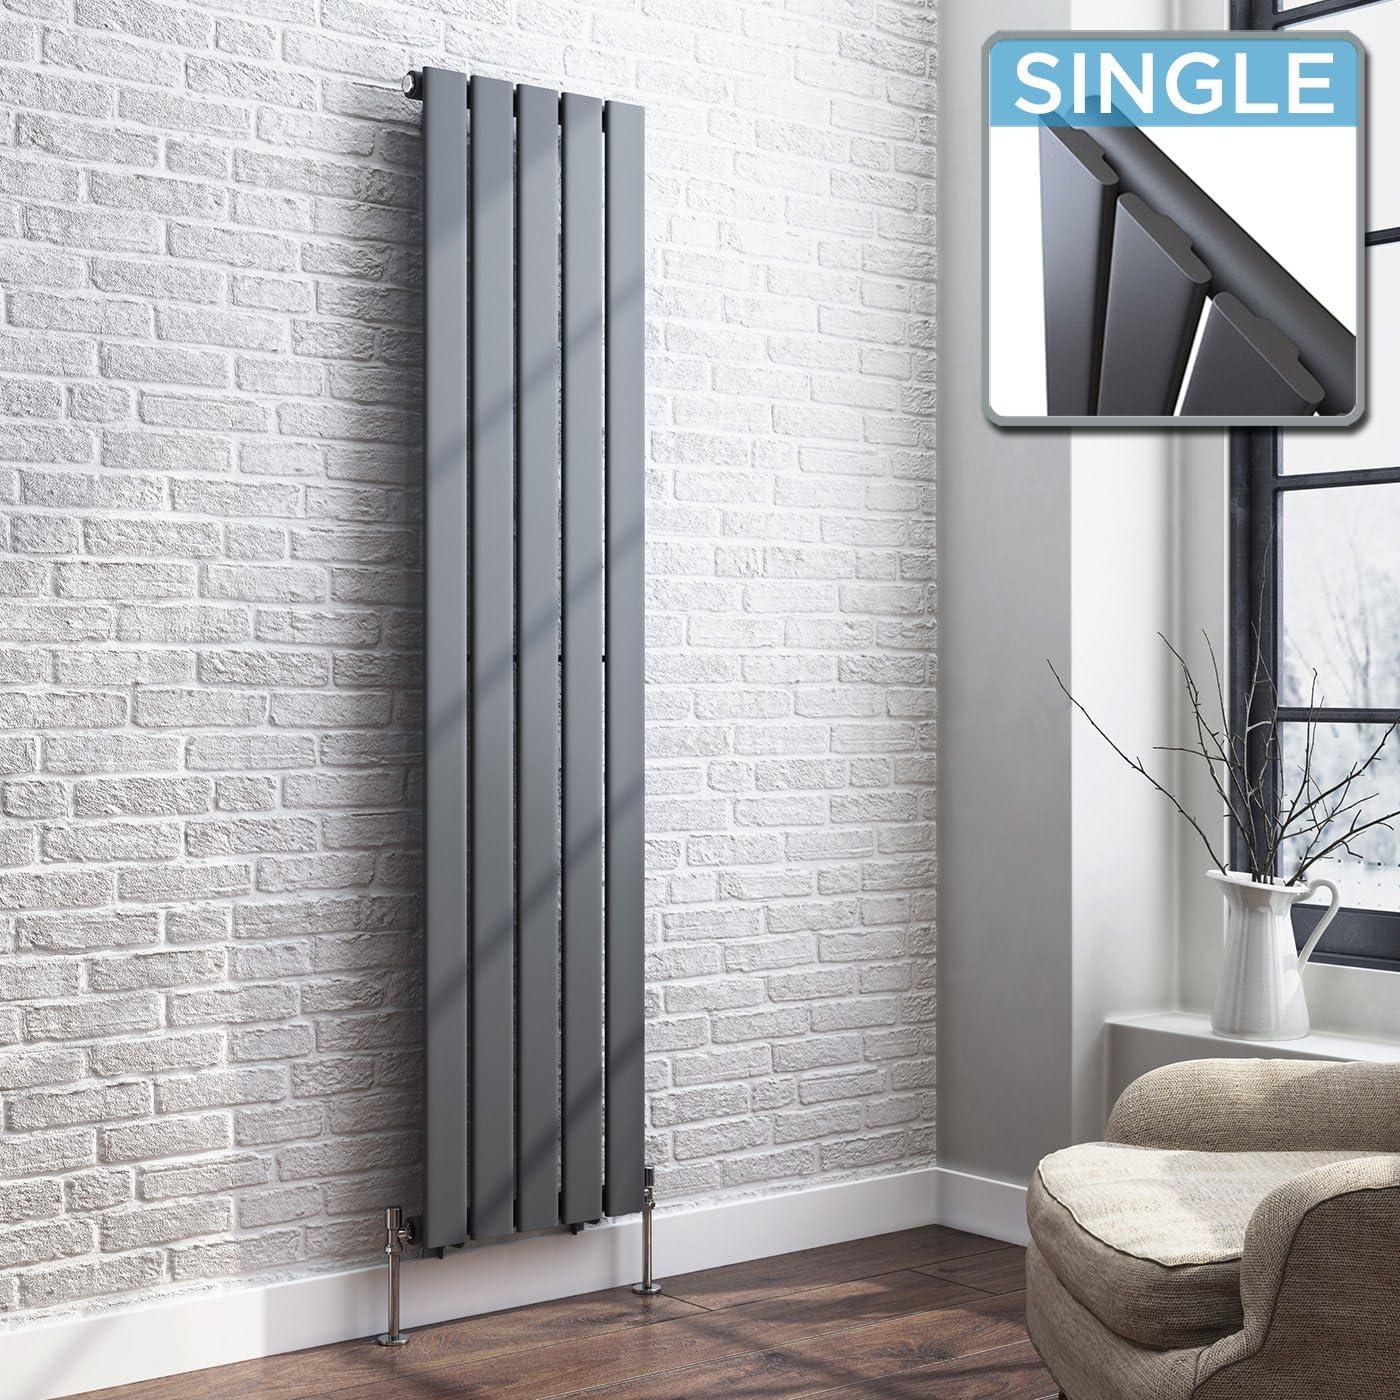 iBathUK | 1600 x 360 Vertical Column Designer Radiator Anthracite Single Flat Panel